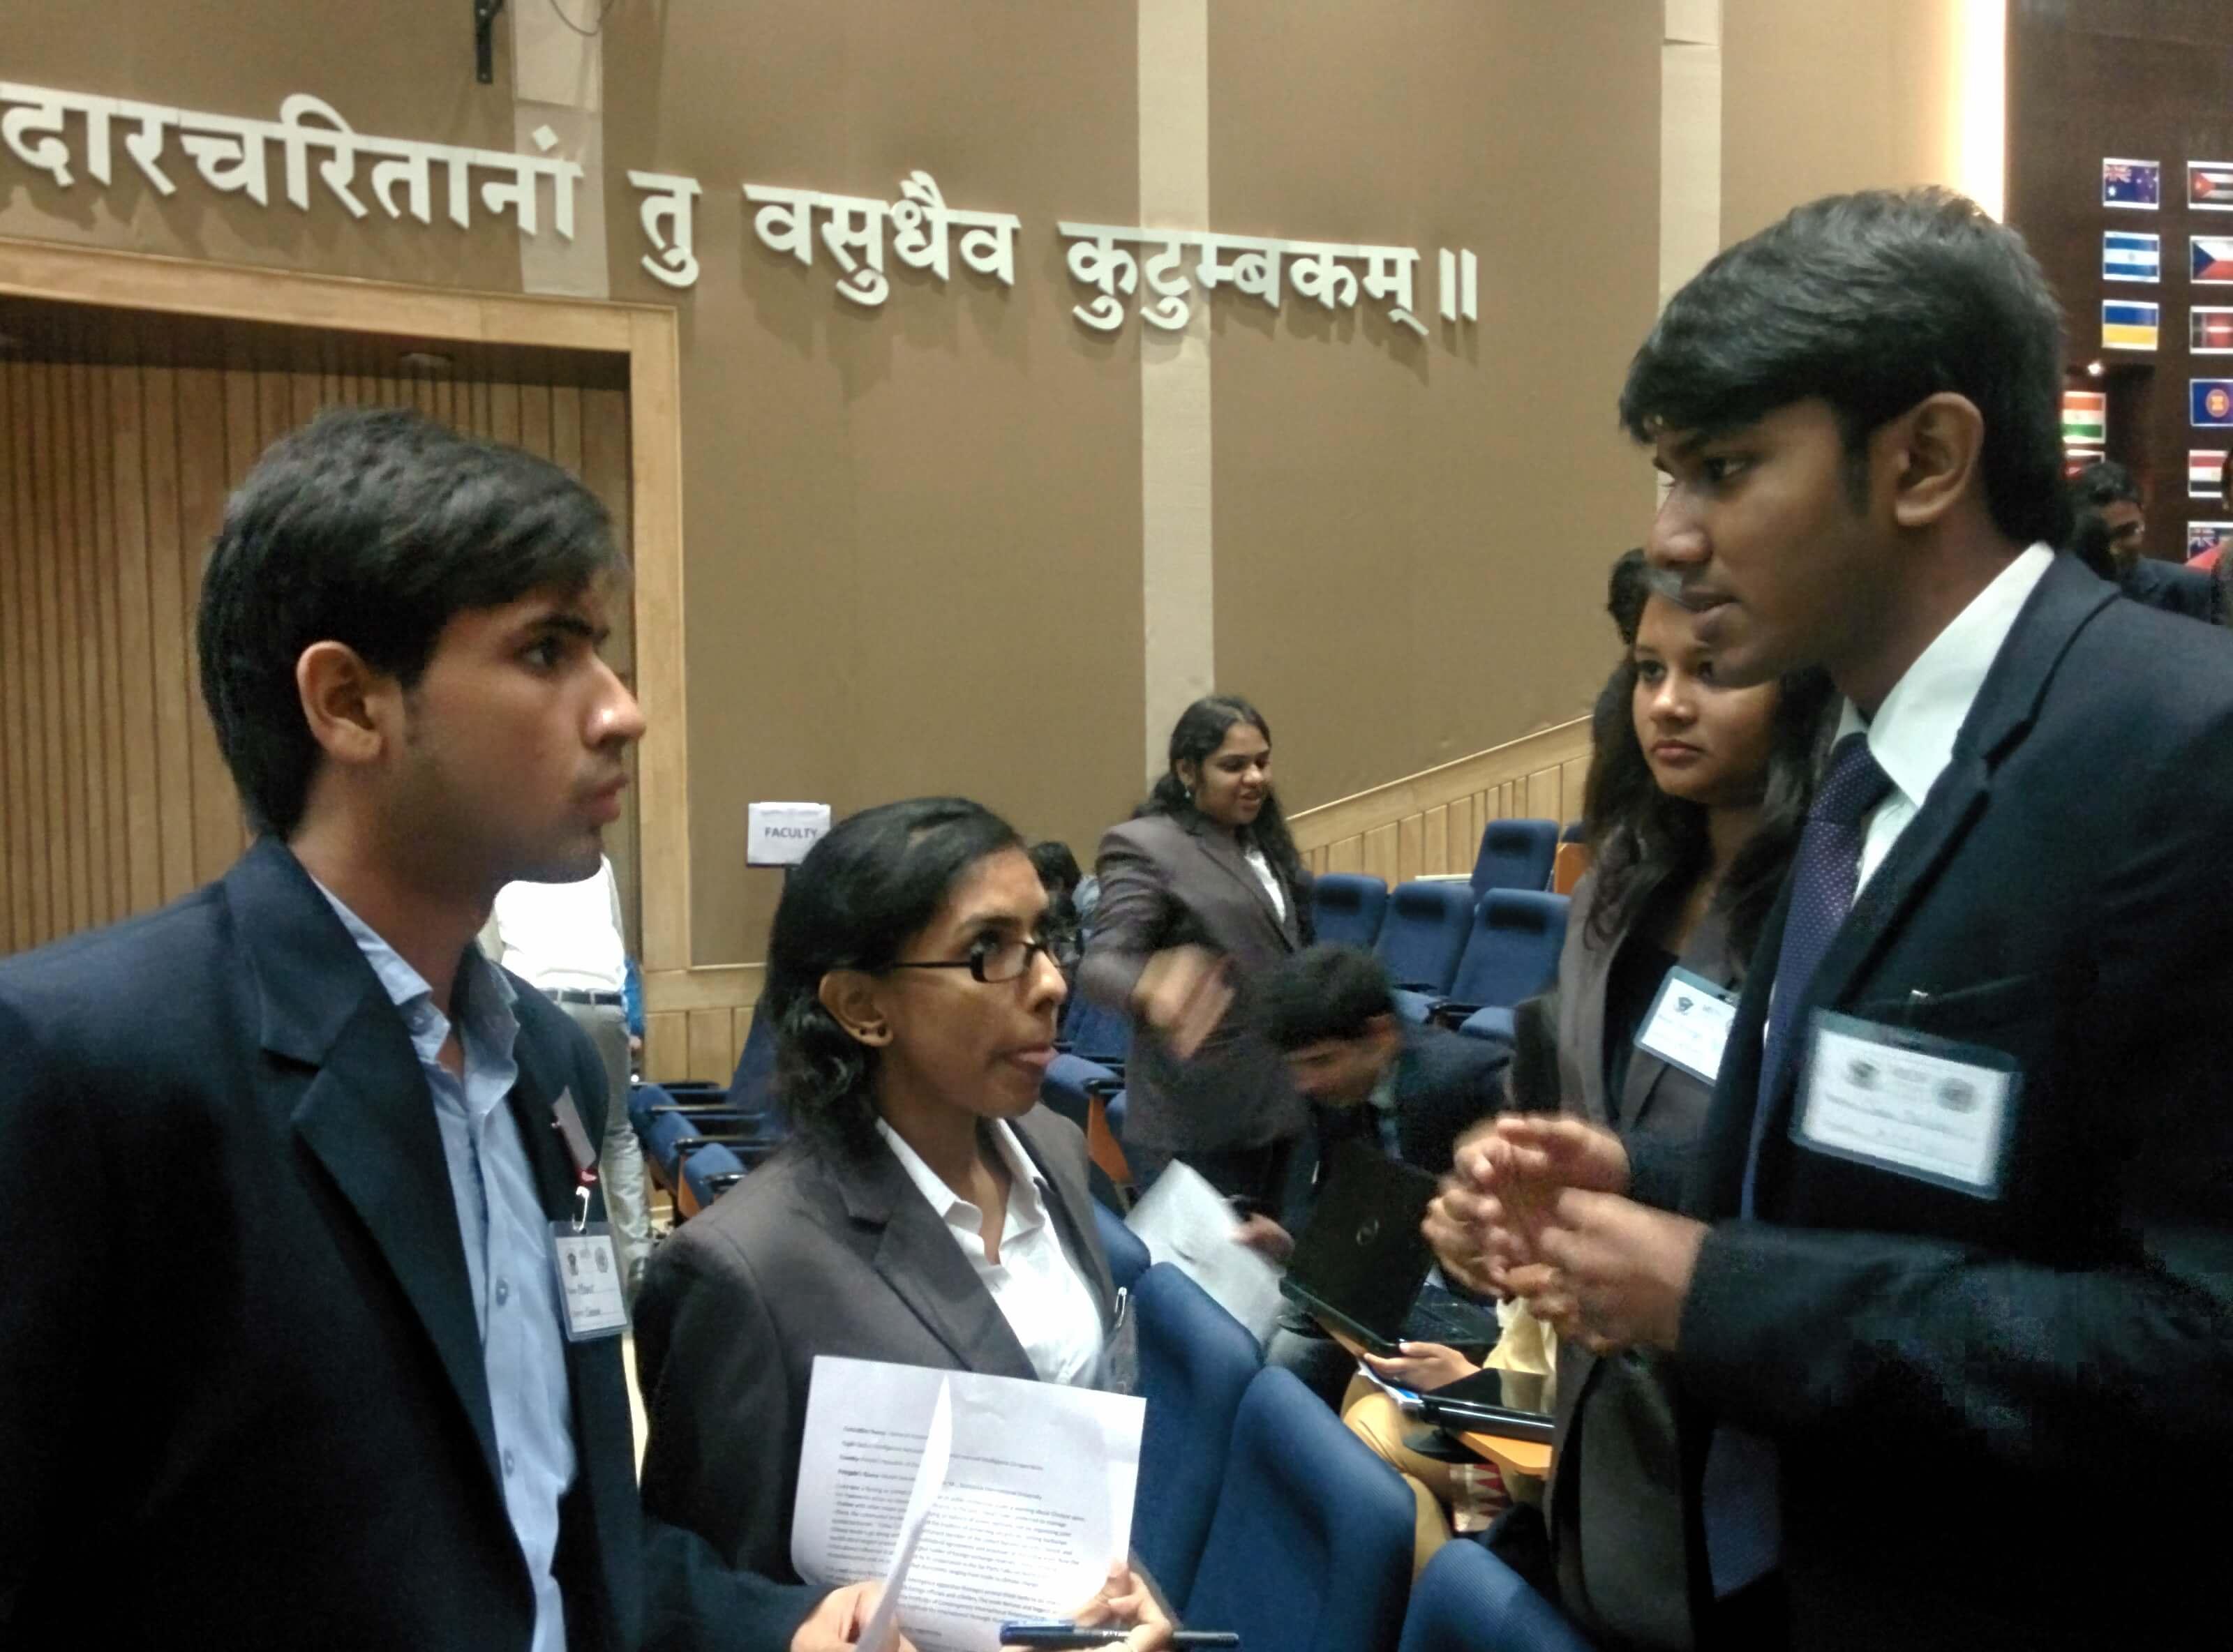 B-Schools & Networking